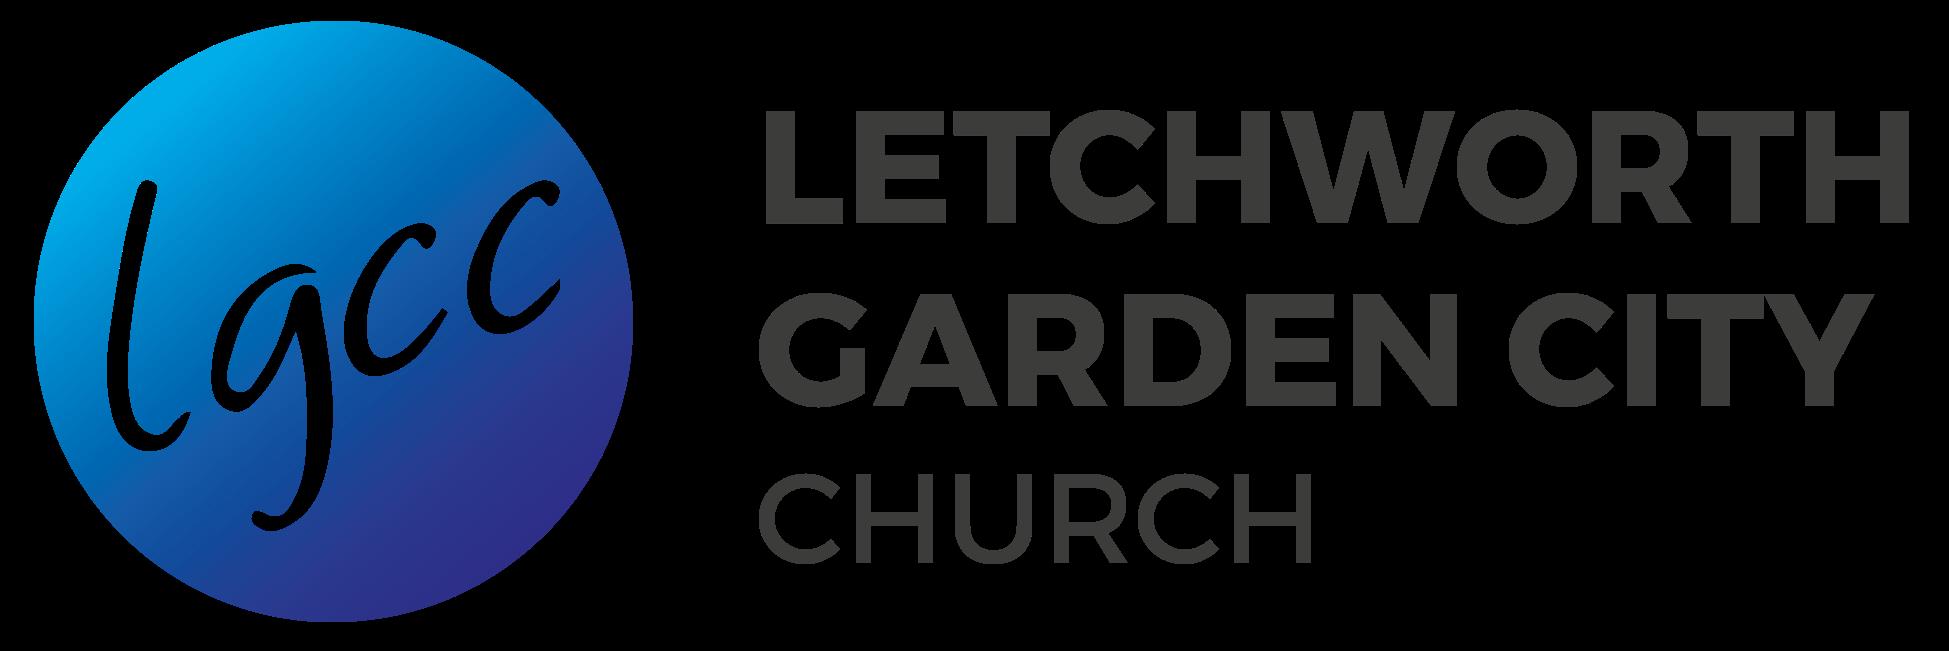 Letchworth Garden City Church